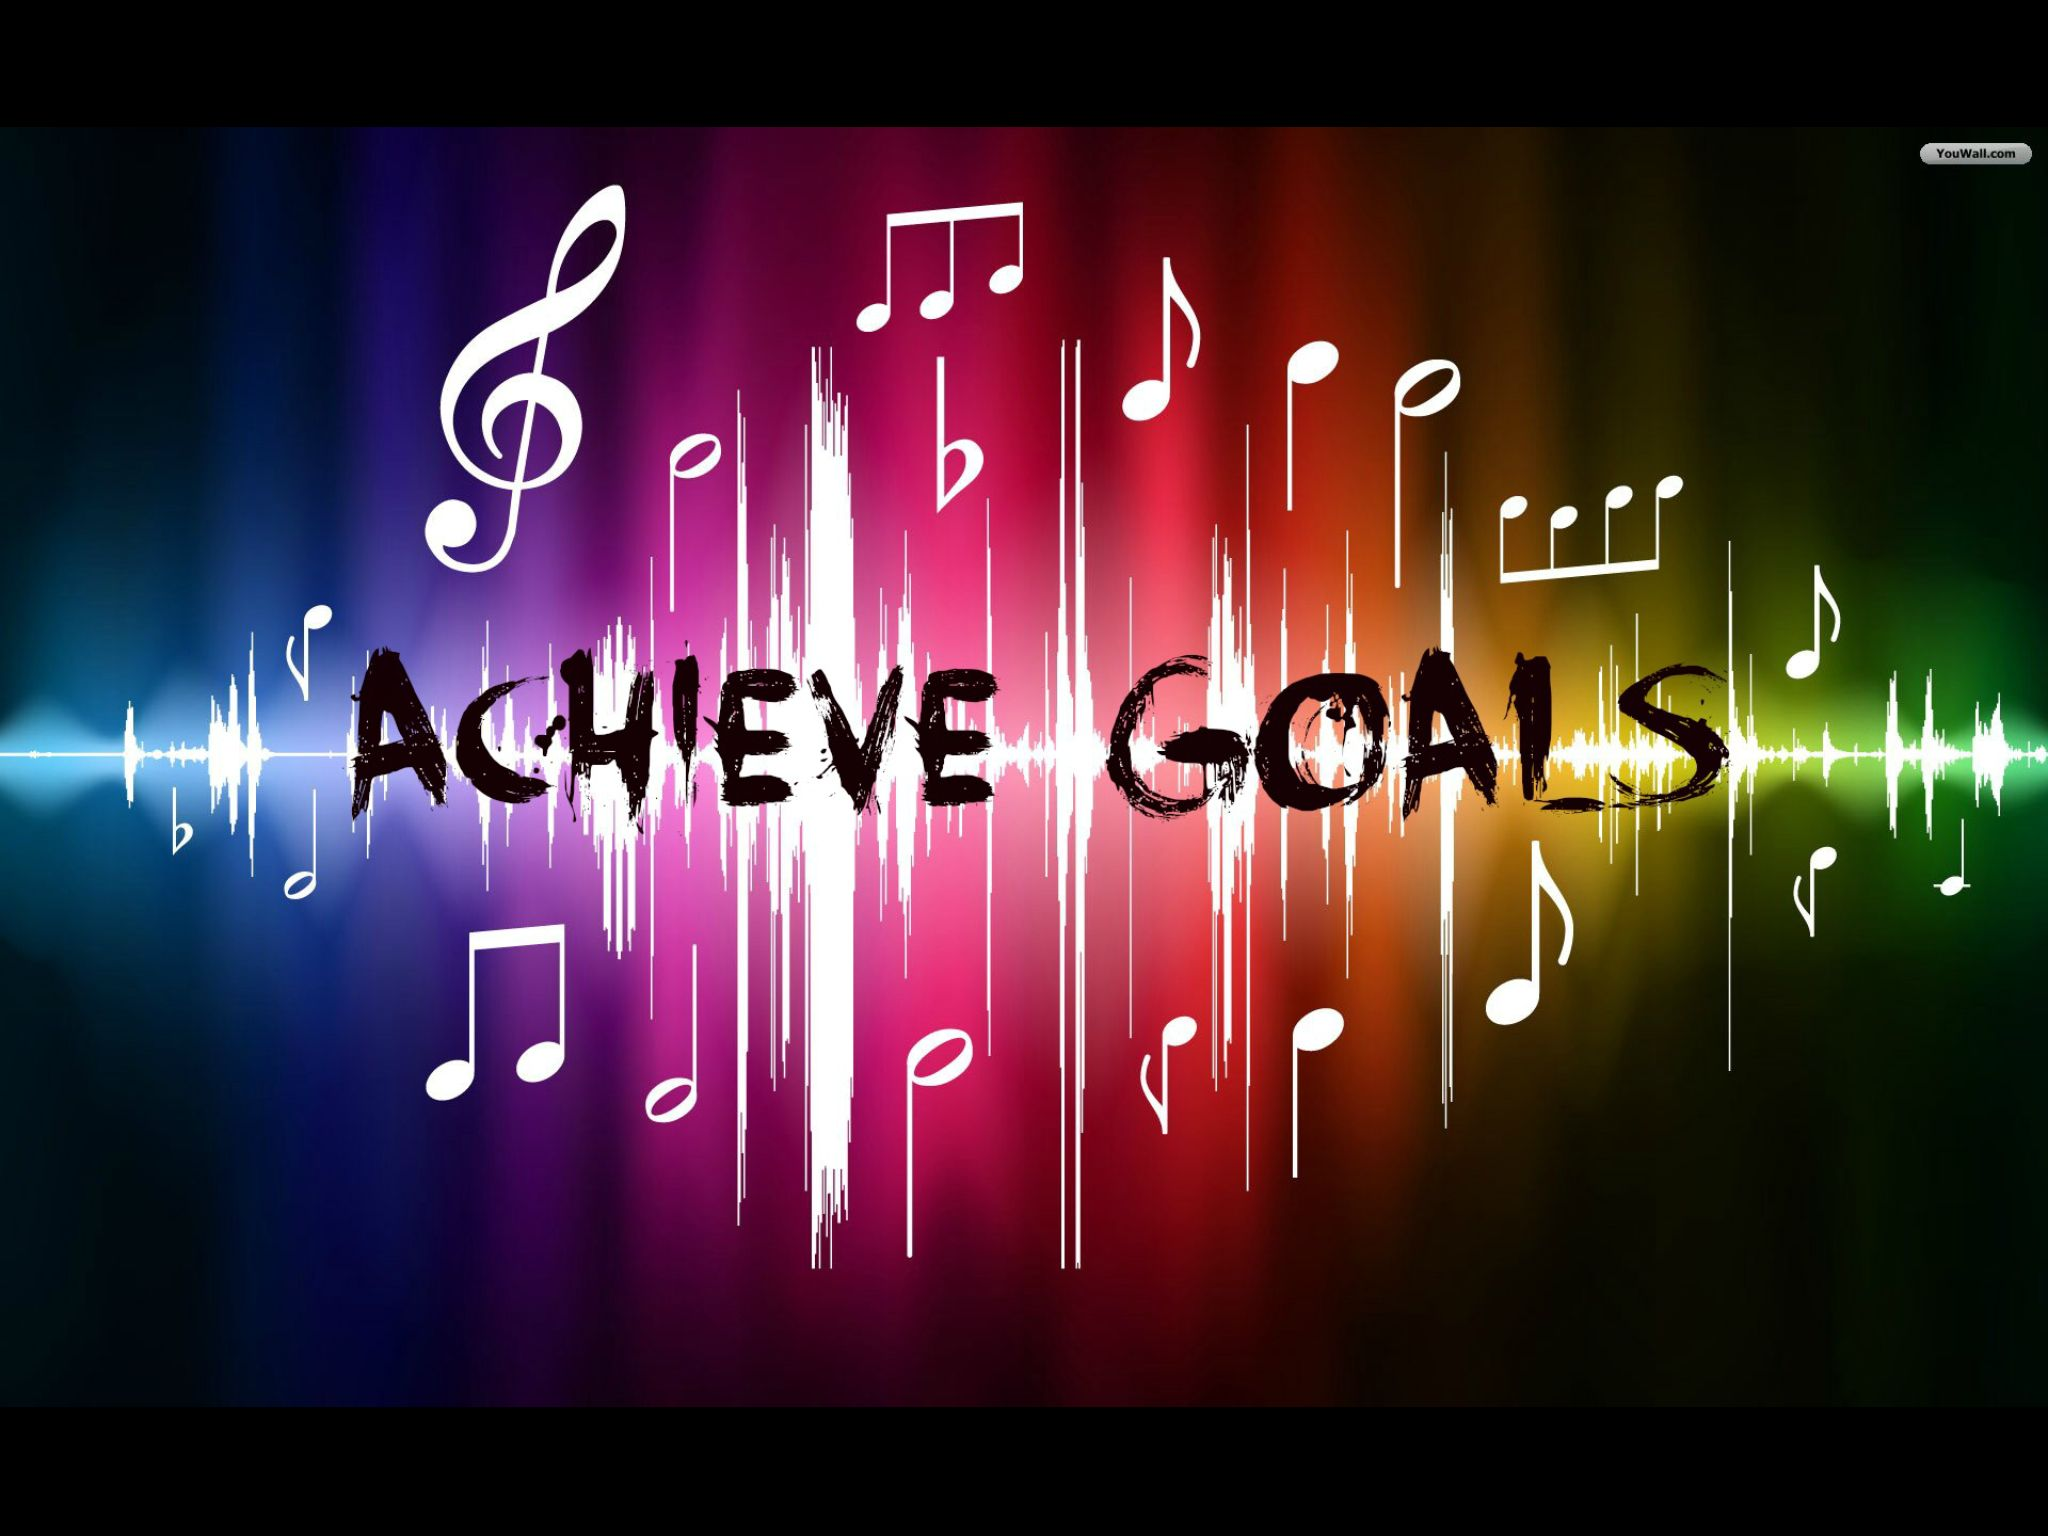 Believe and you will achieve #goals #beliefs #achievements #success